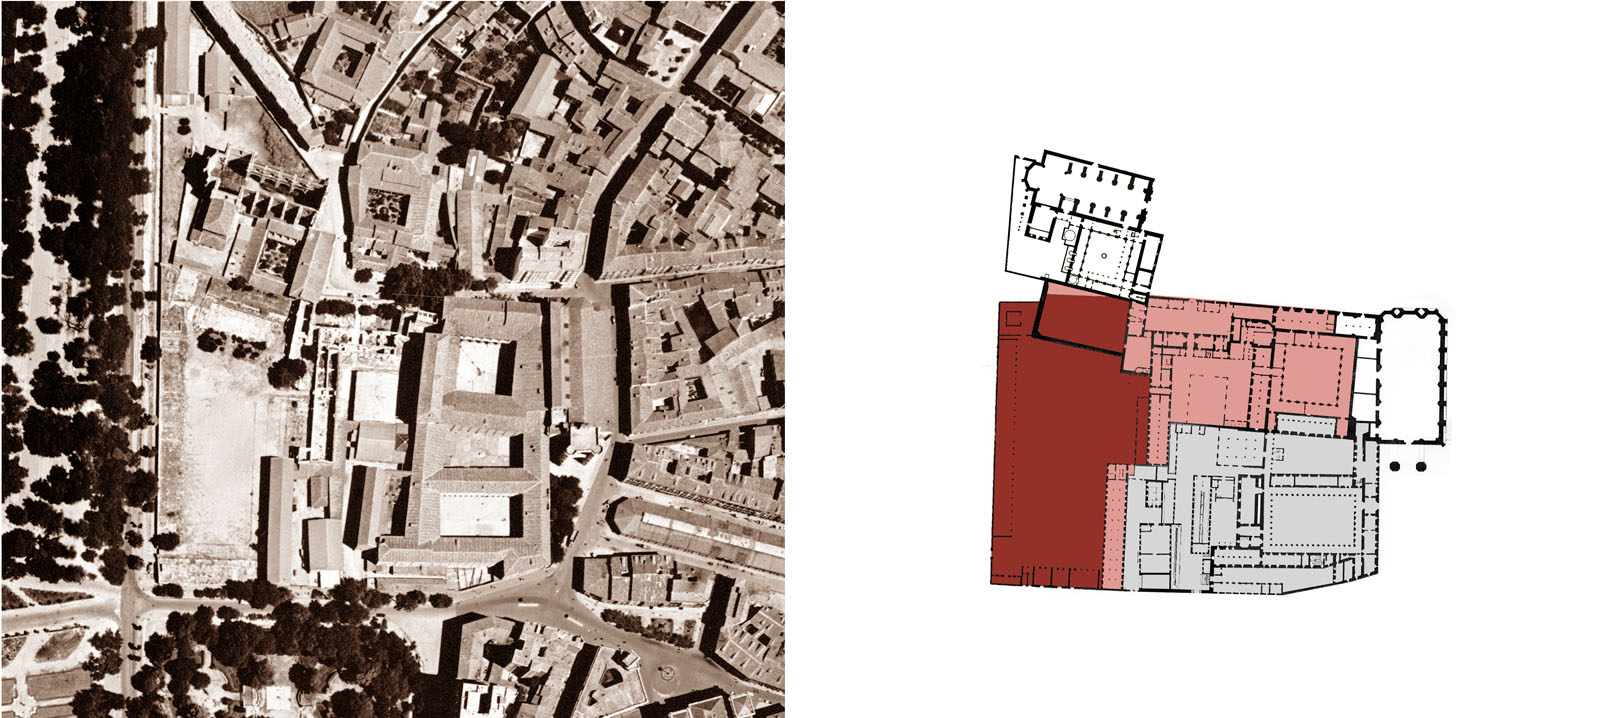 danielvillalobos-huesosfisac-miguelfisac-modernarchitecture-17